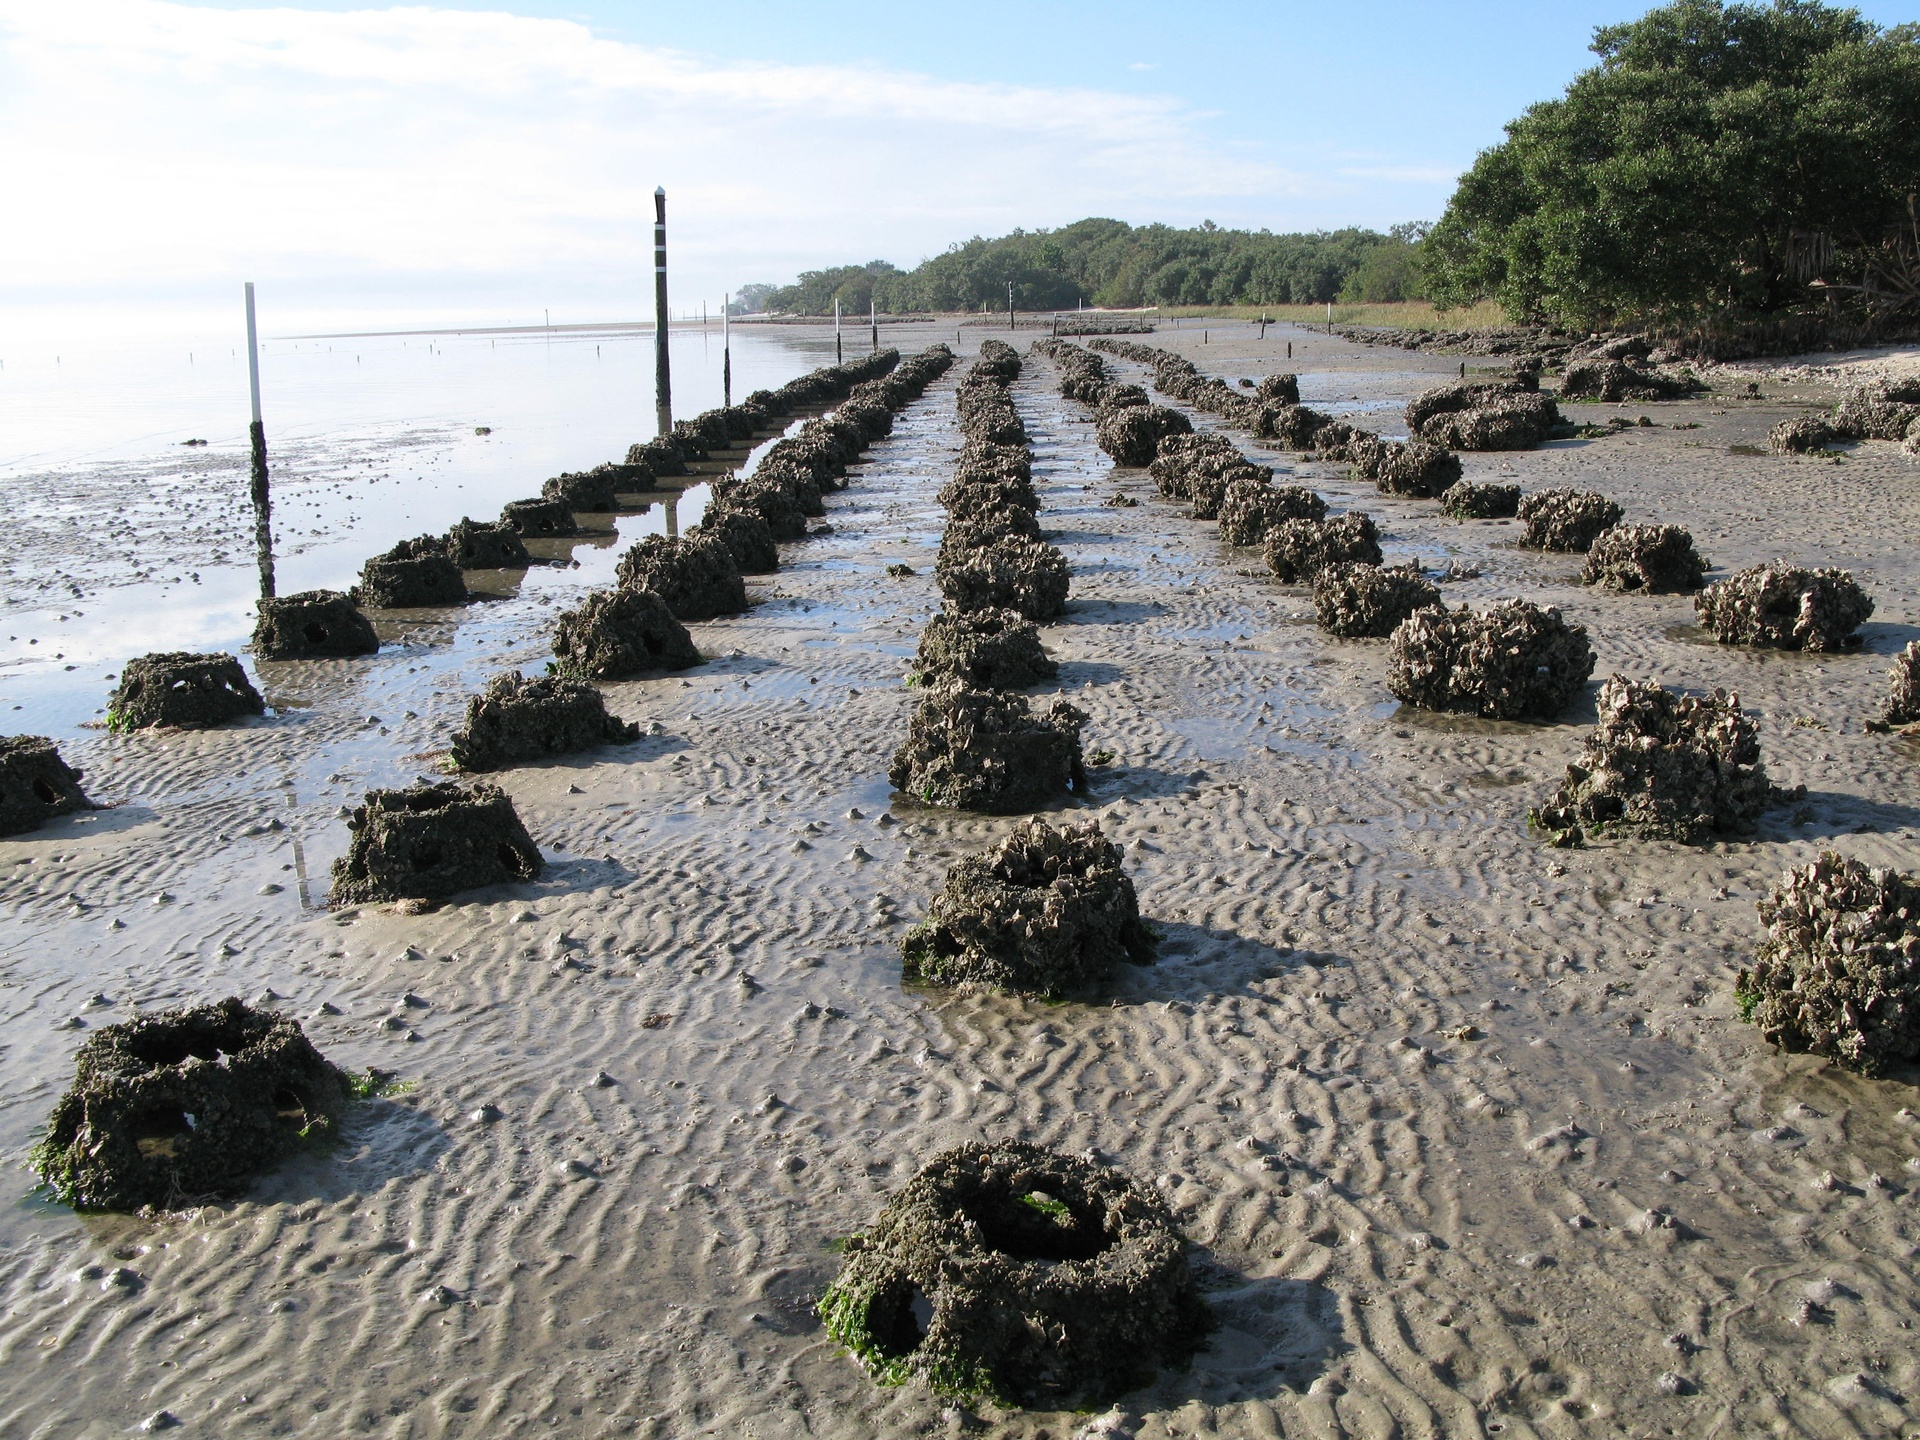 Oyster reef habitat restoration work in Tampa Bay, Florida